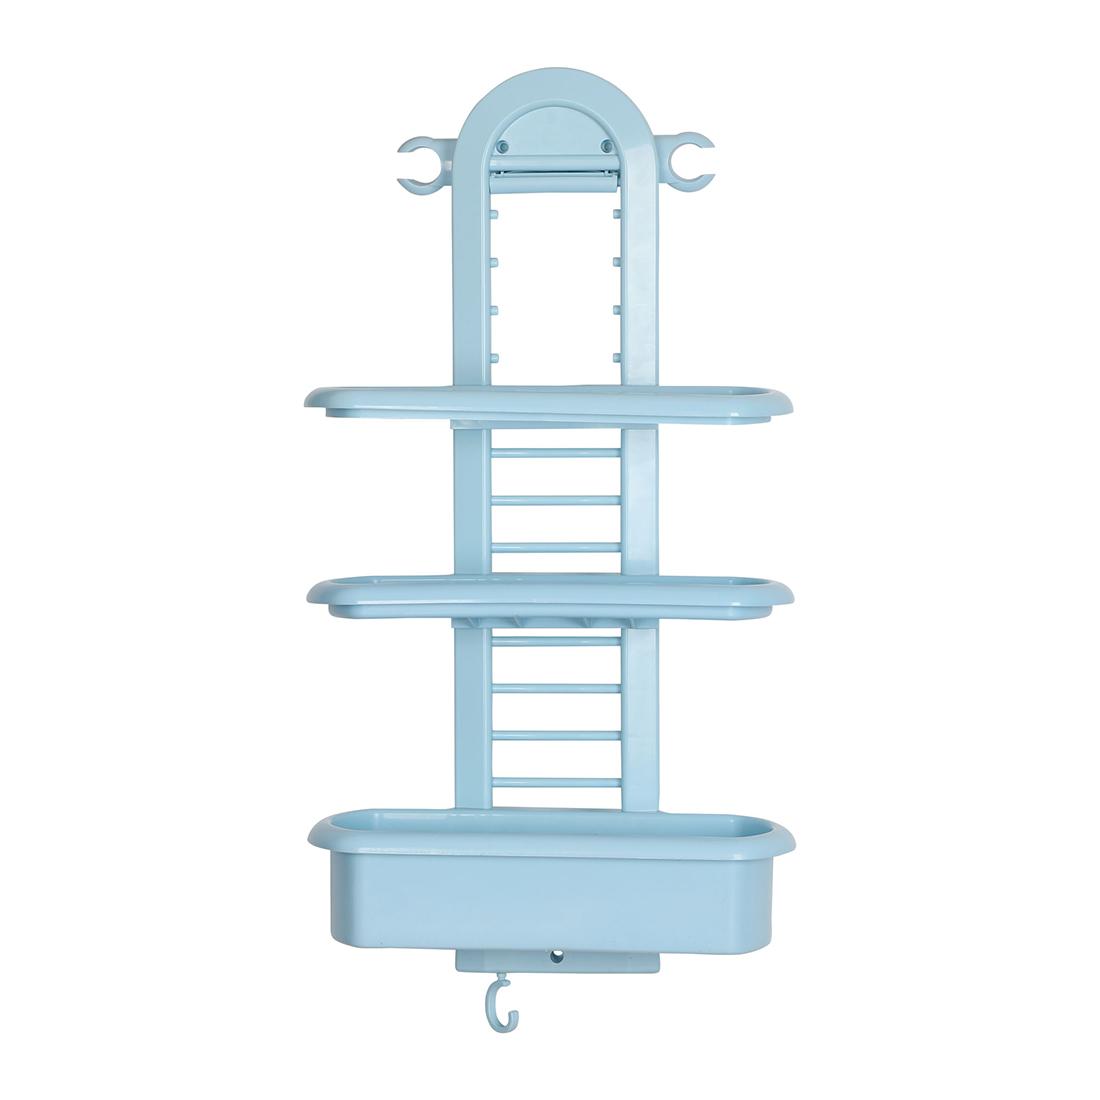 Plastic 3 Tier Hanging Bathroom Tub Shower Shelf Organizer for Bathroom Blue - image 9 of 9